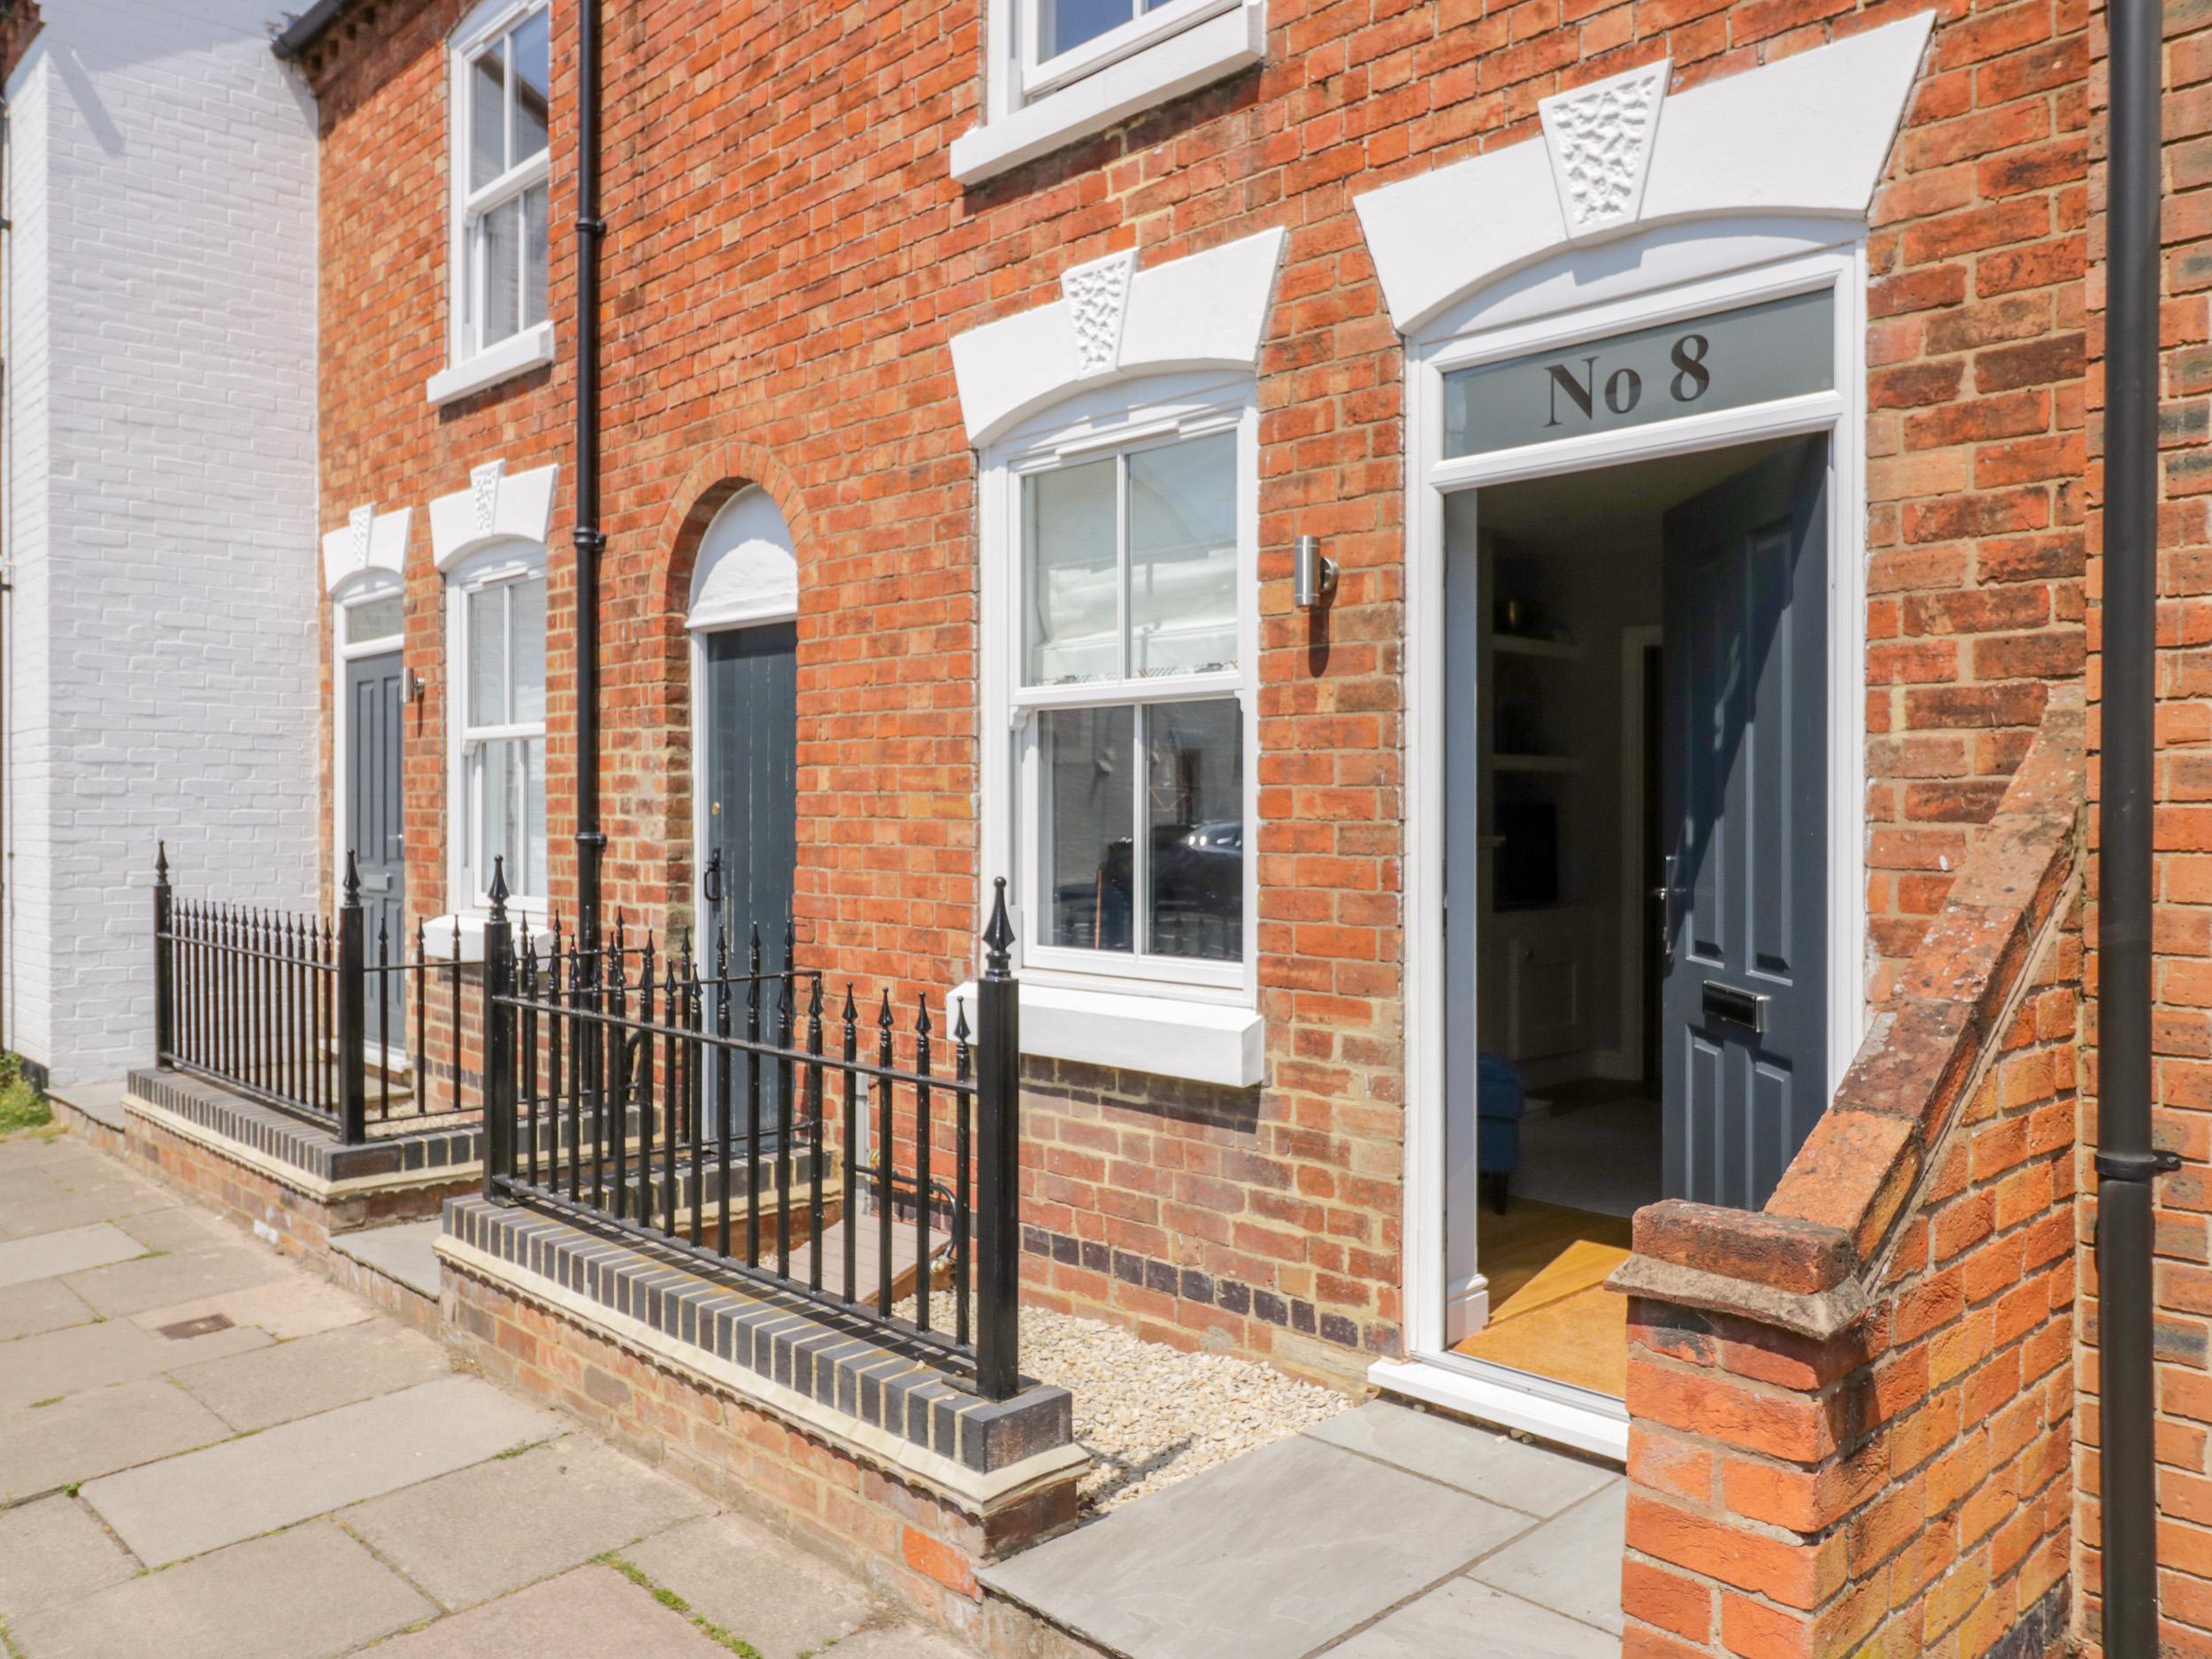 2 bedroom Cottage for rent in Stratford upon Avon